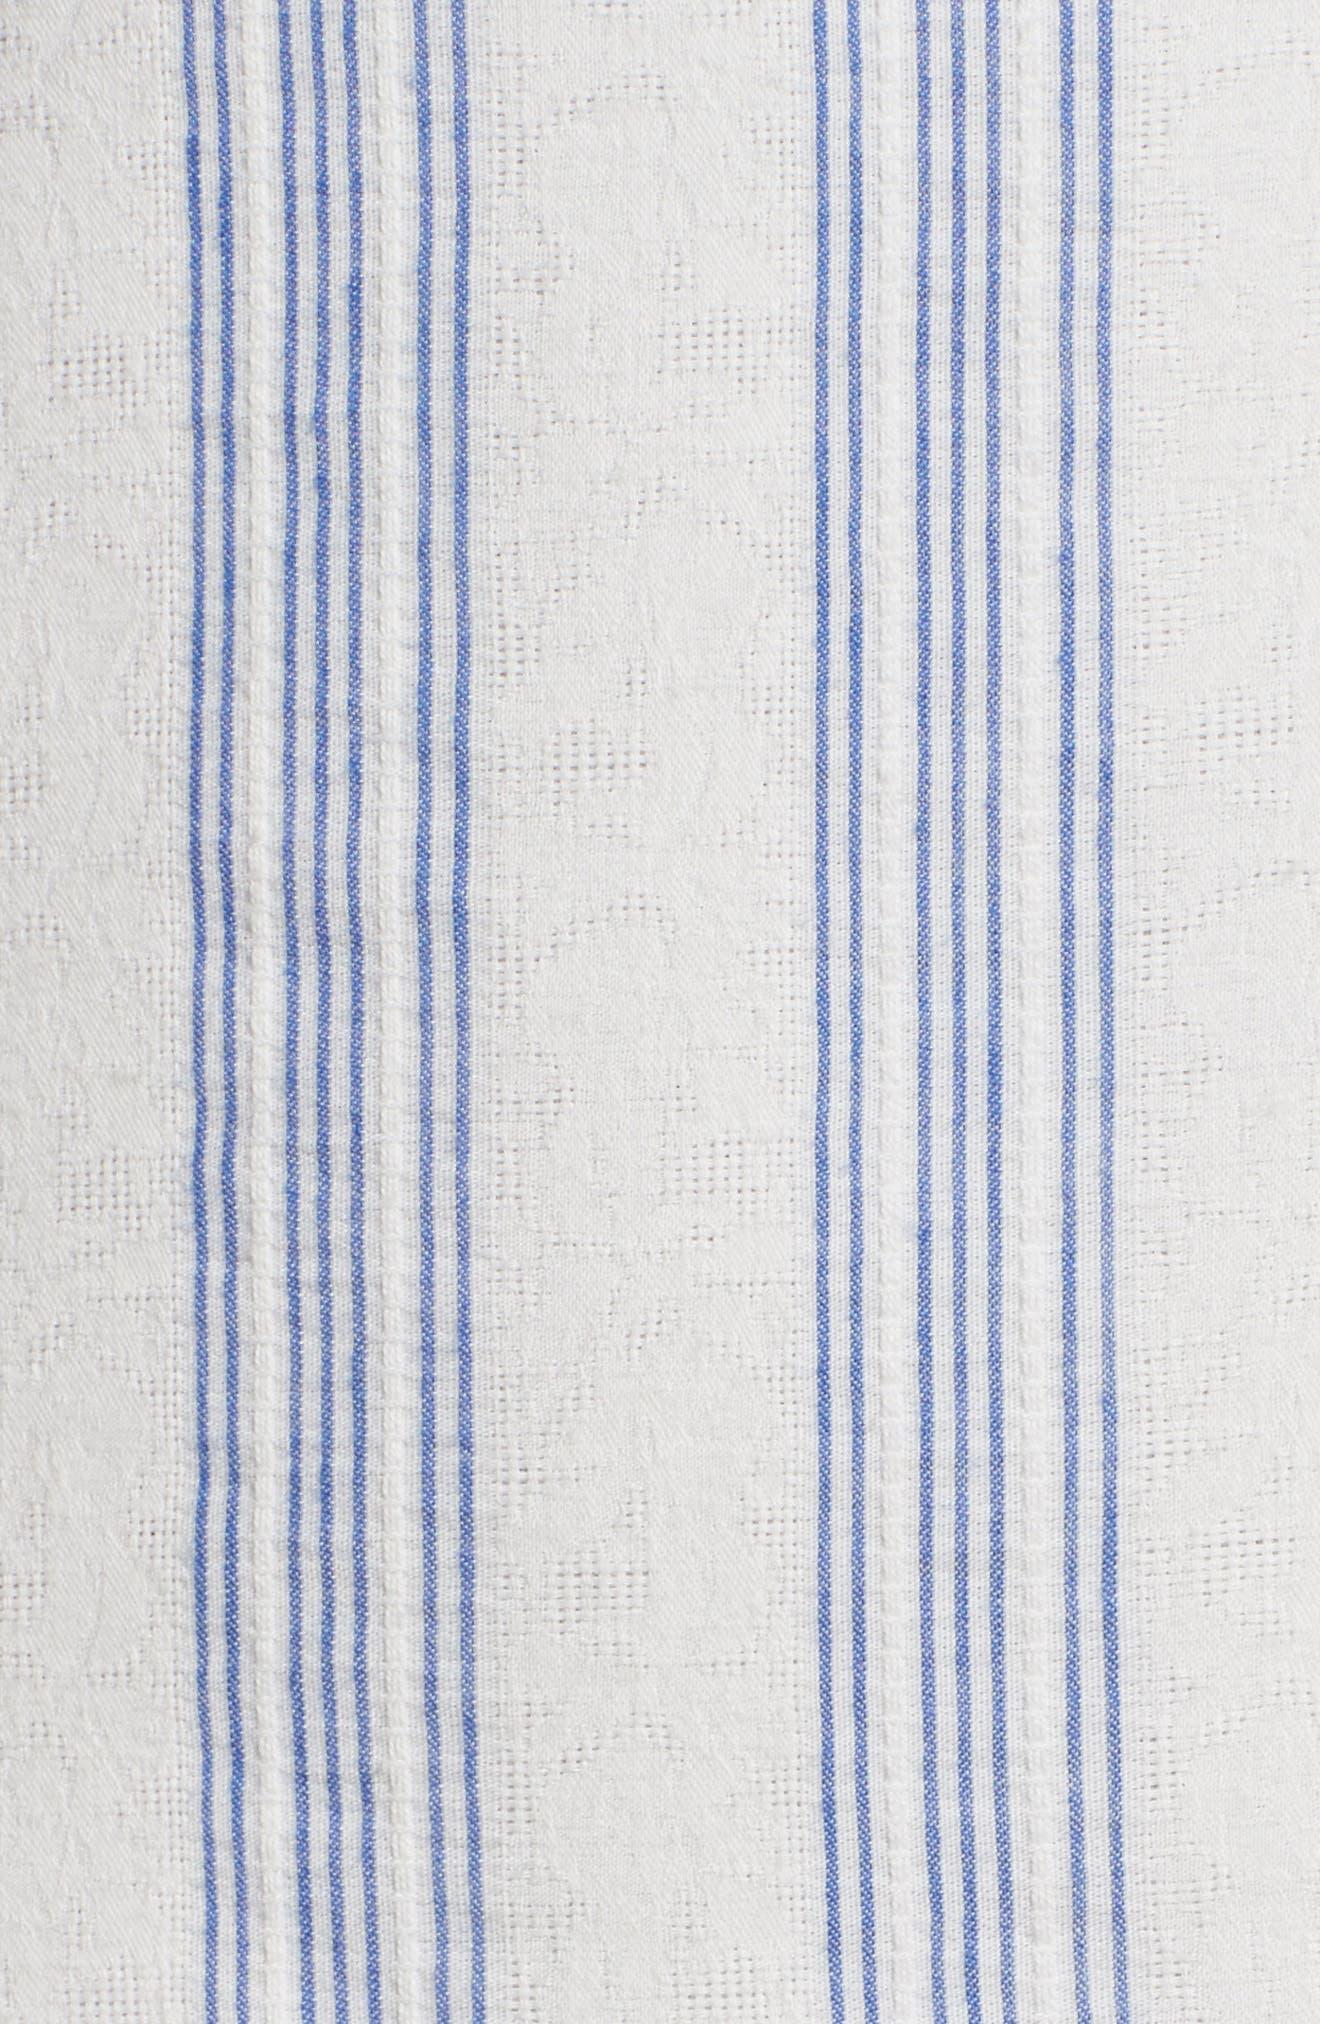 Stripe Ruffle Sheath Dress,                             Alternate thumbnail 5, color,                             White/ Blue